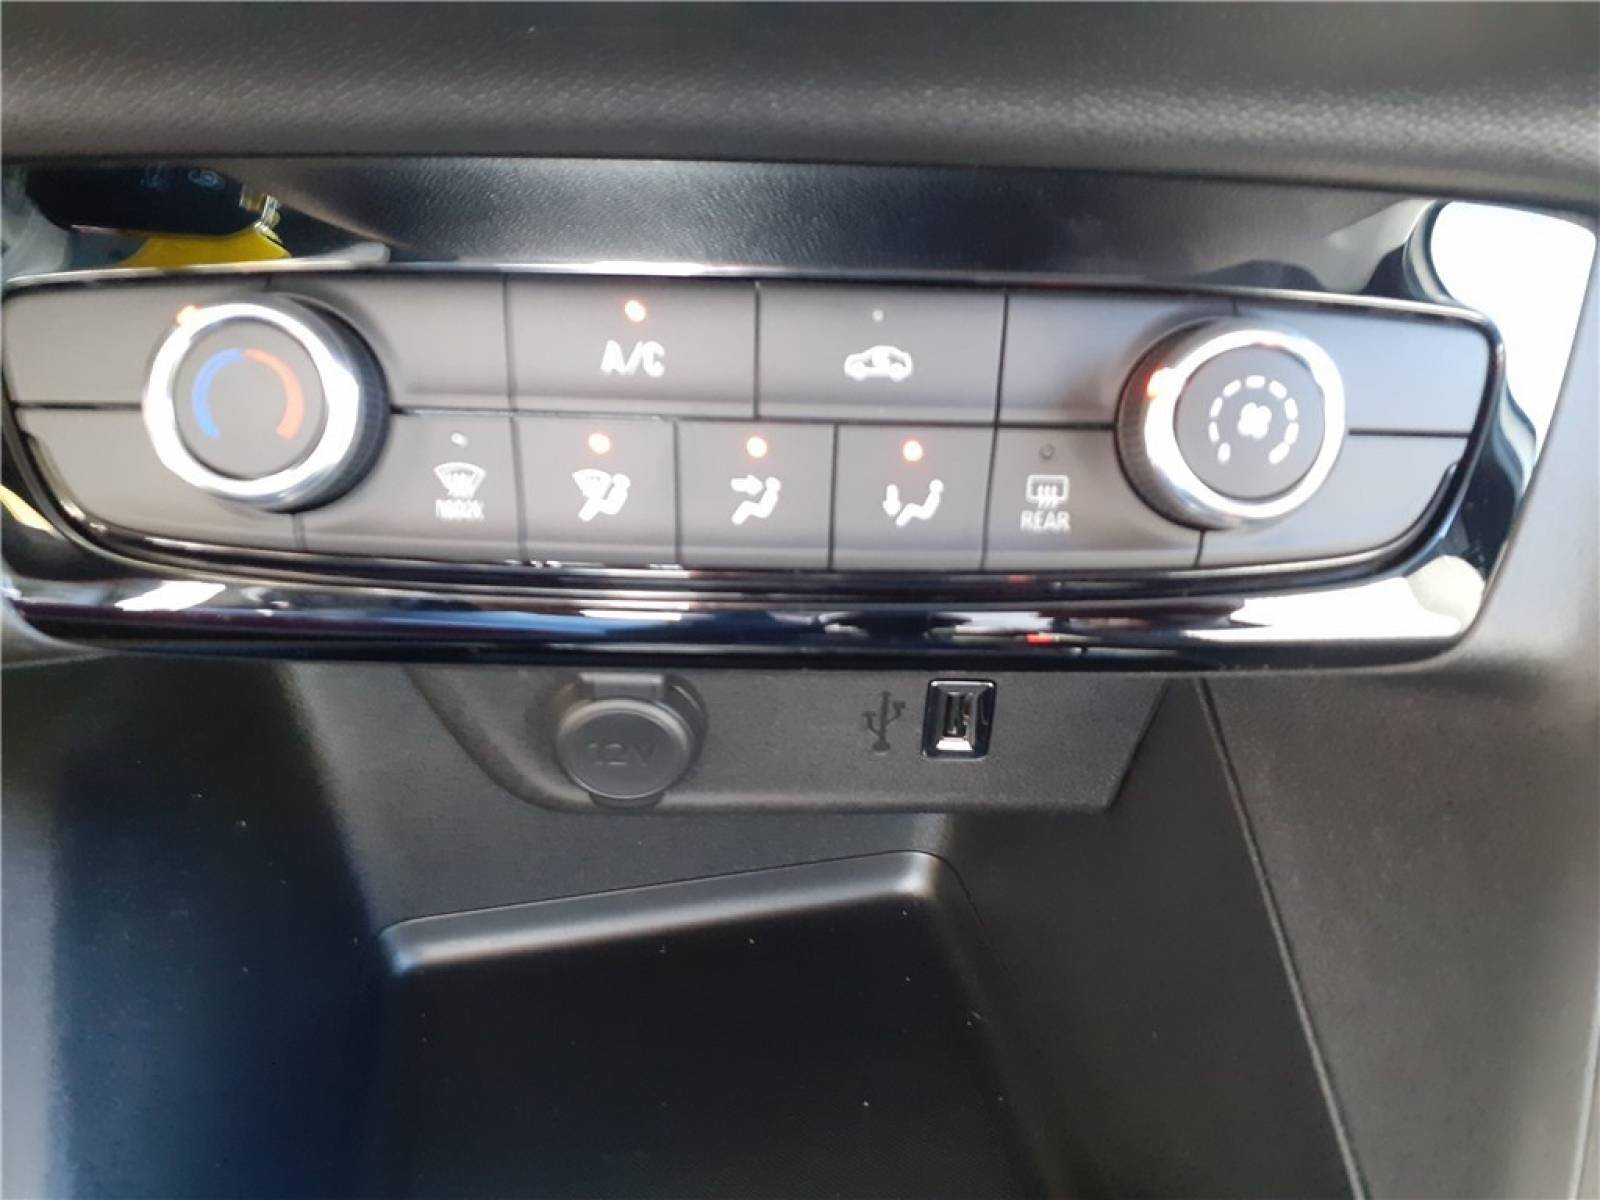 OPEL Corsa 1.2 Turbo 100 ch BVM6 - véhicule d'occasion - Groupe Guillet - Opel Magicauto - Chalon-sur-Saône - 71380 - Saint-Marcel - 30